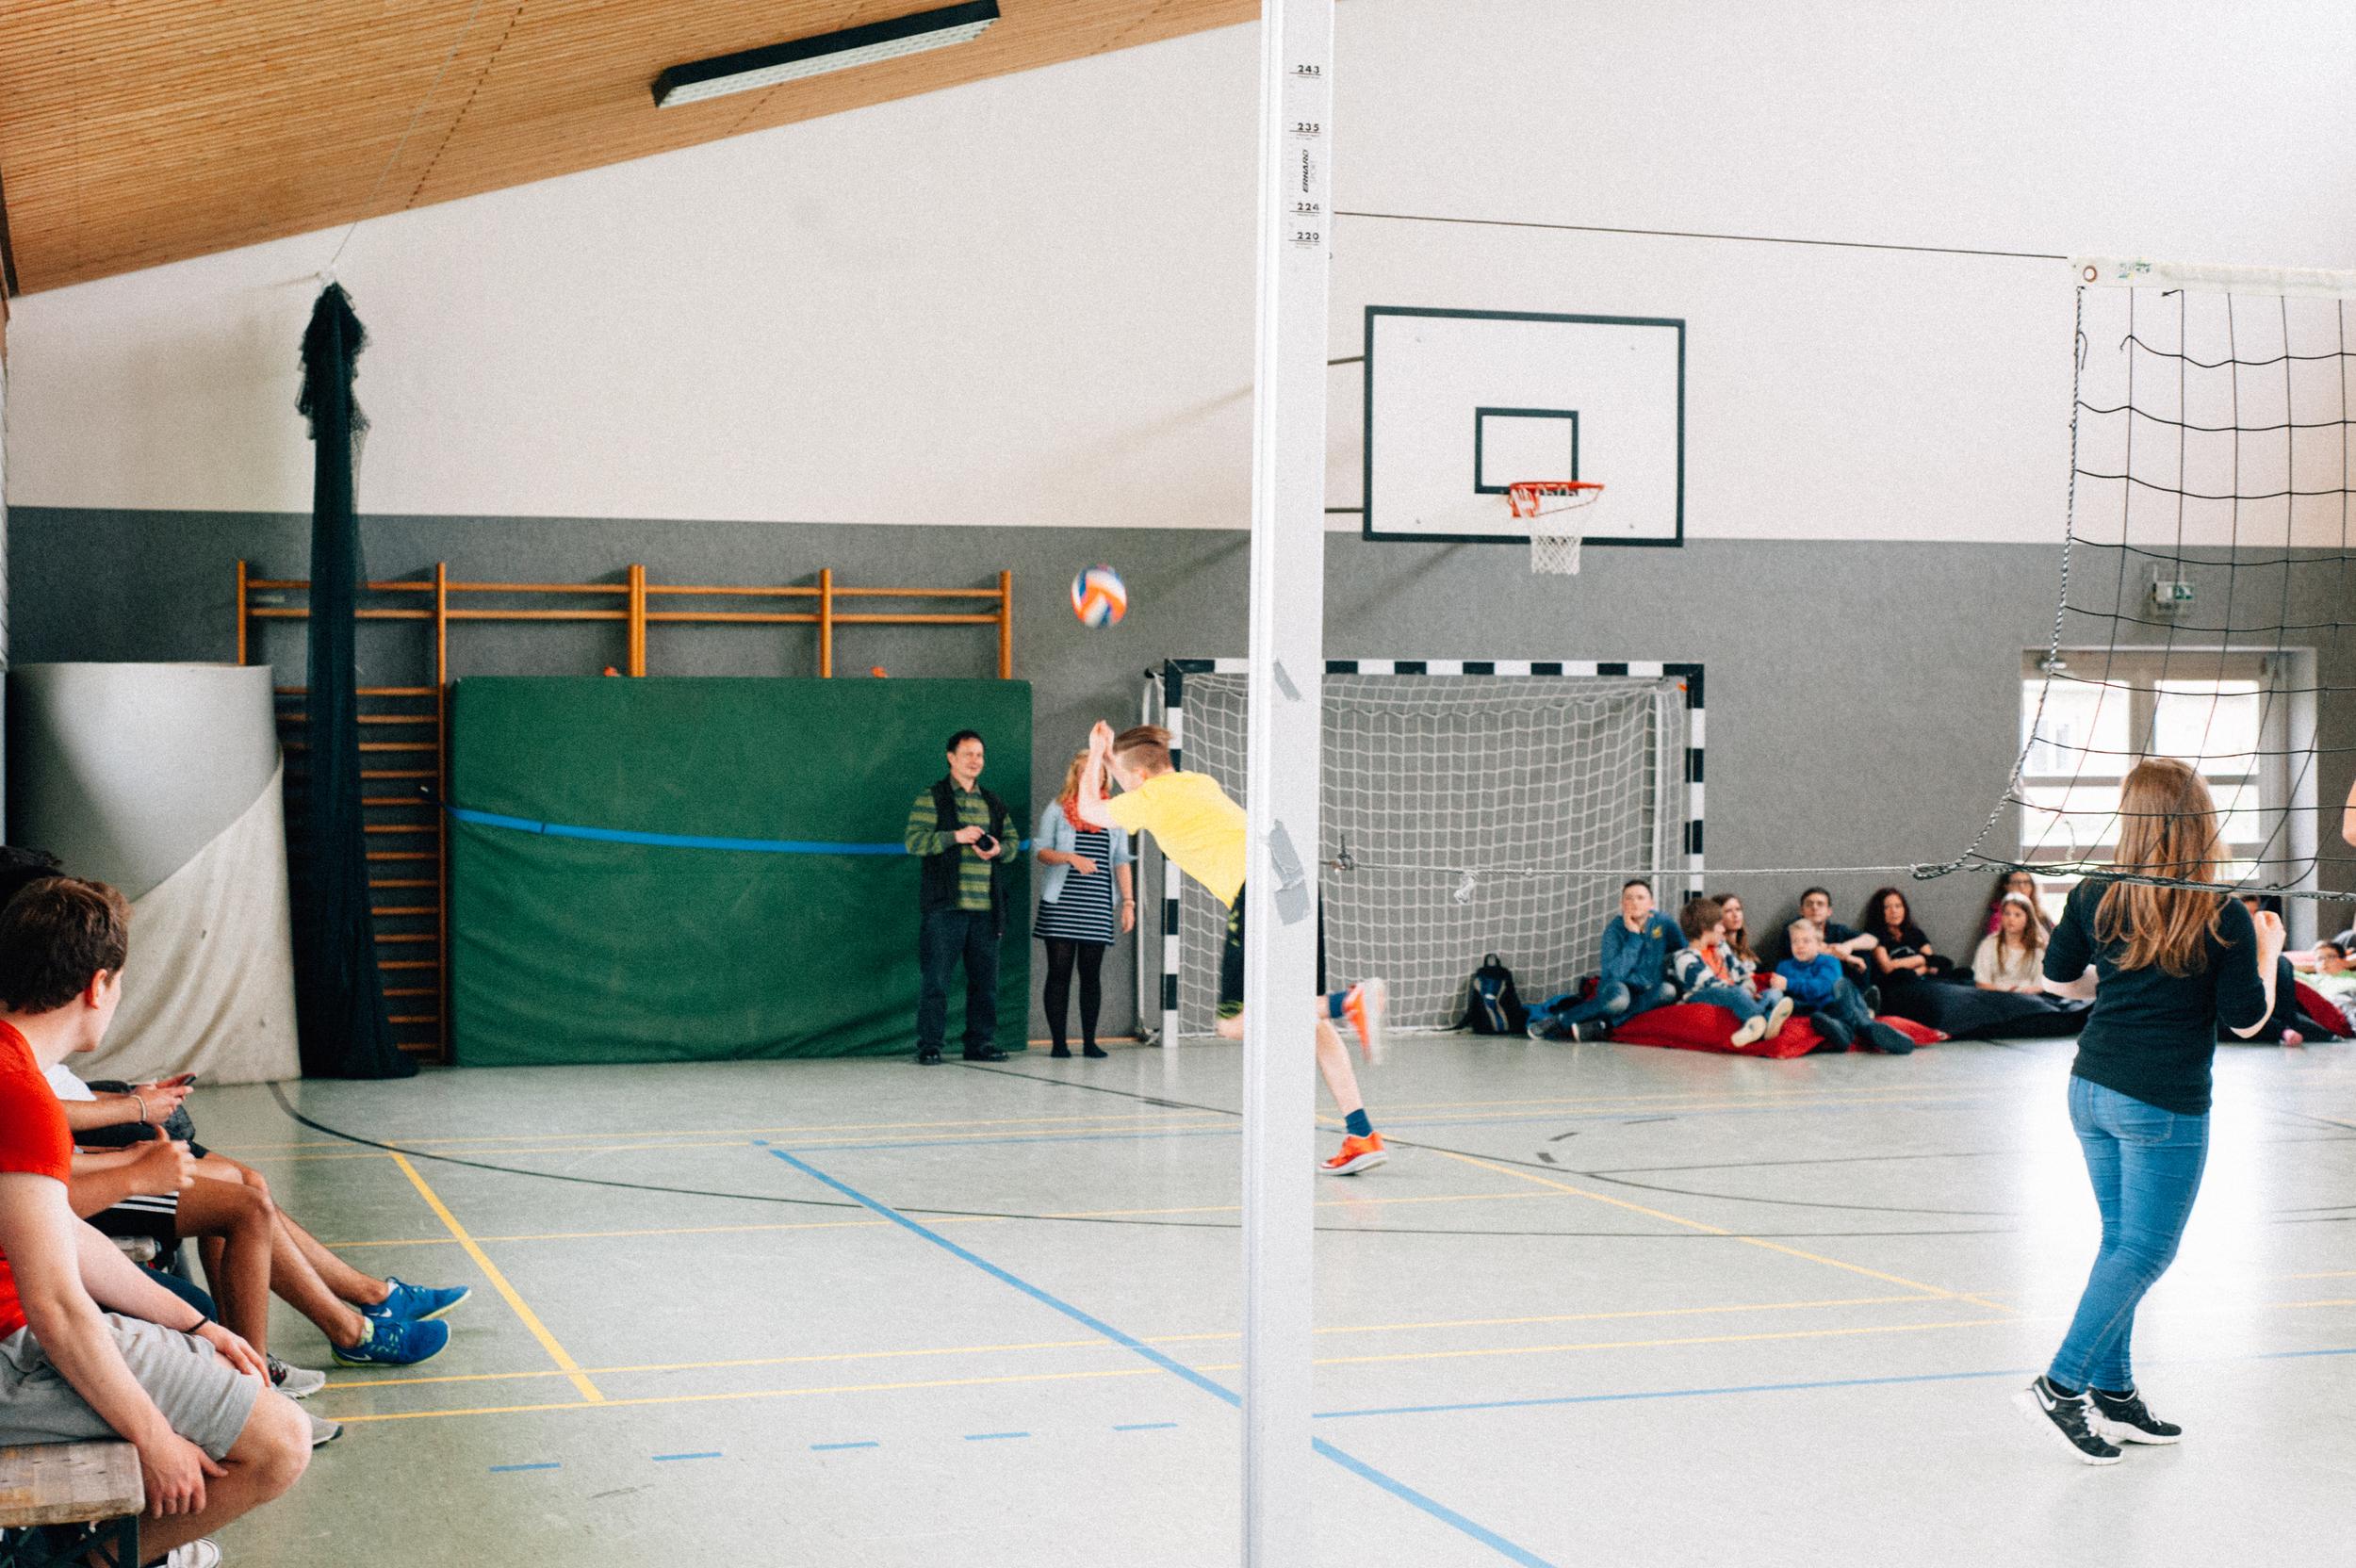 BDE-Auswahl-photocredit-anton-ahrens-7442.jpg